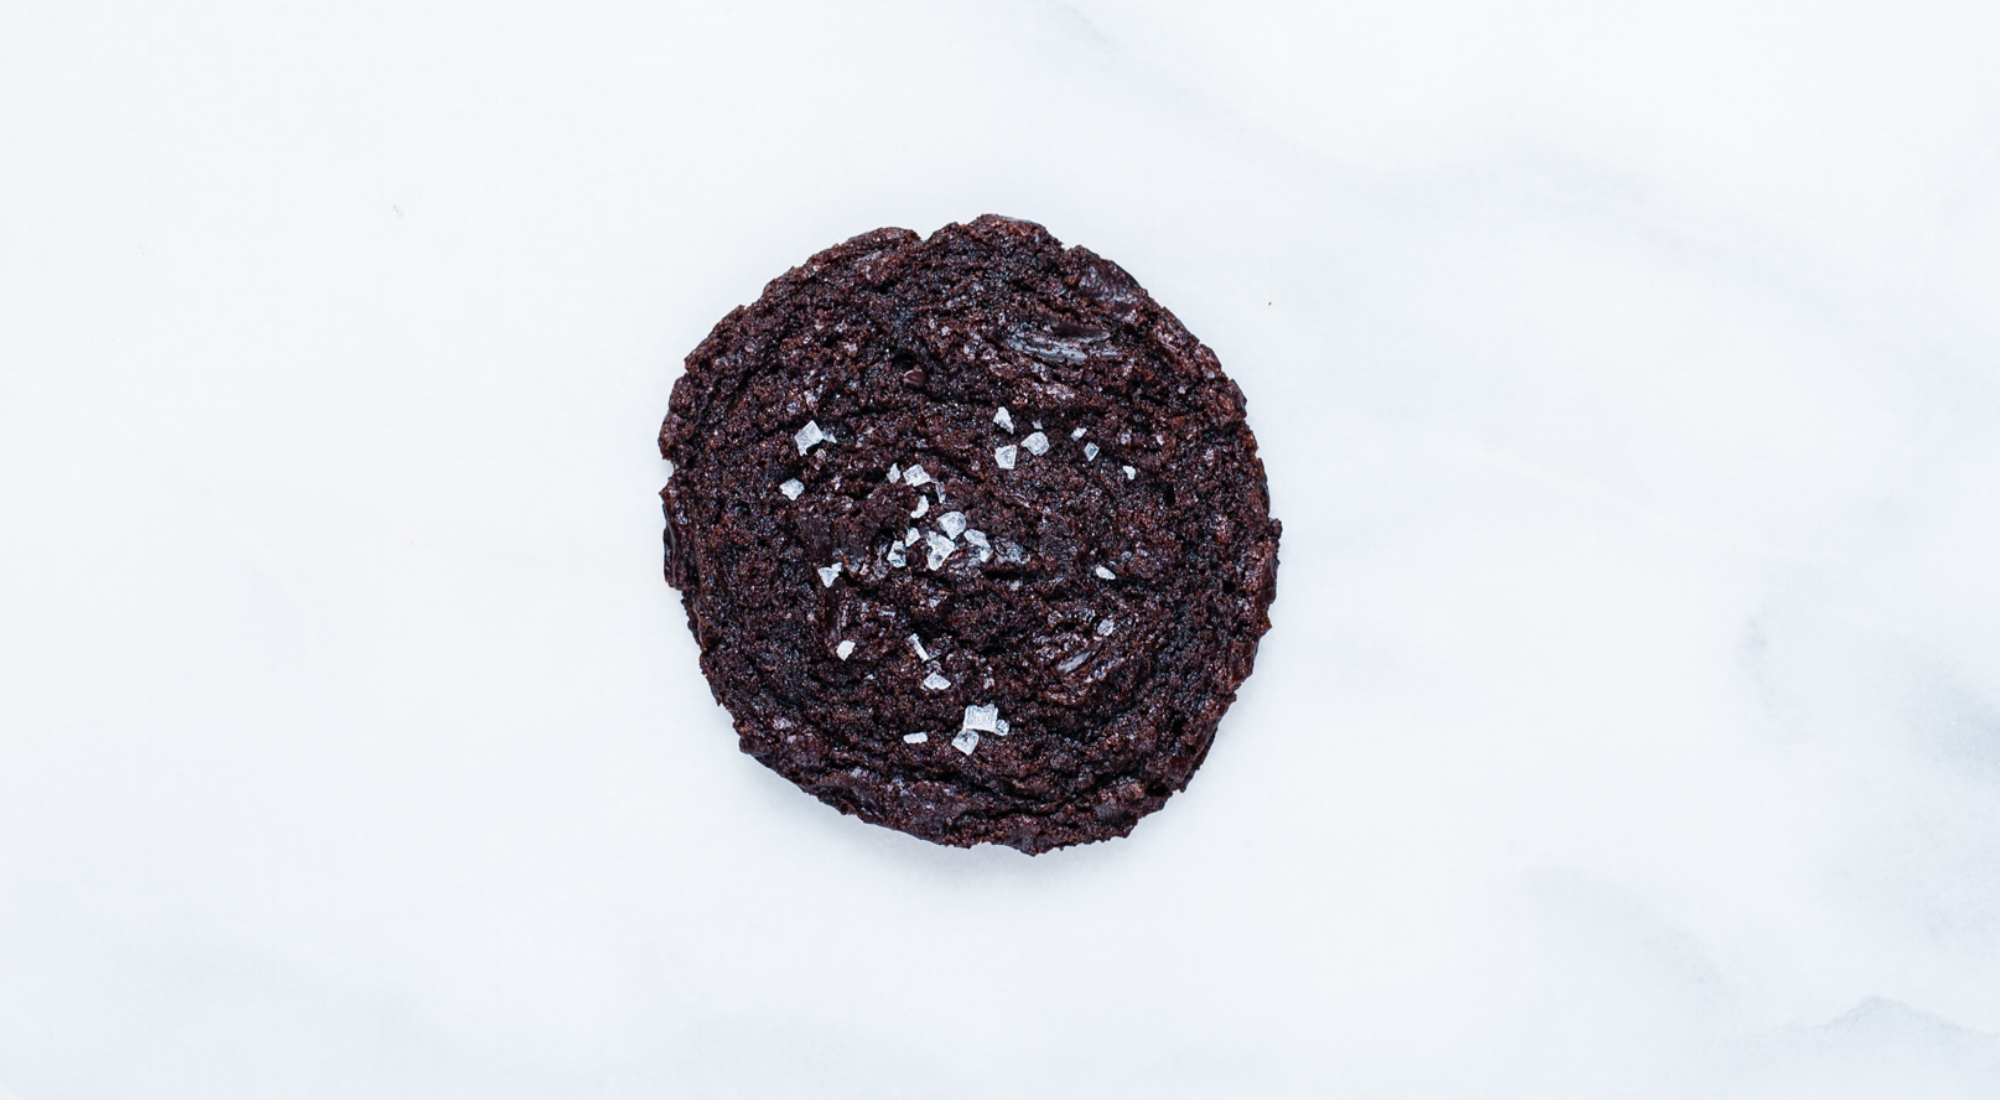 XXX CHOCOLATE COOKIE - Dark Chocolate Chips, Dark Chocolate Cacao - $1.25